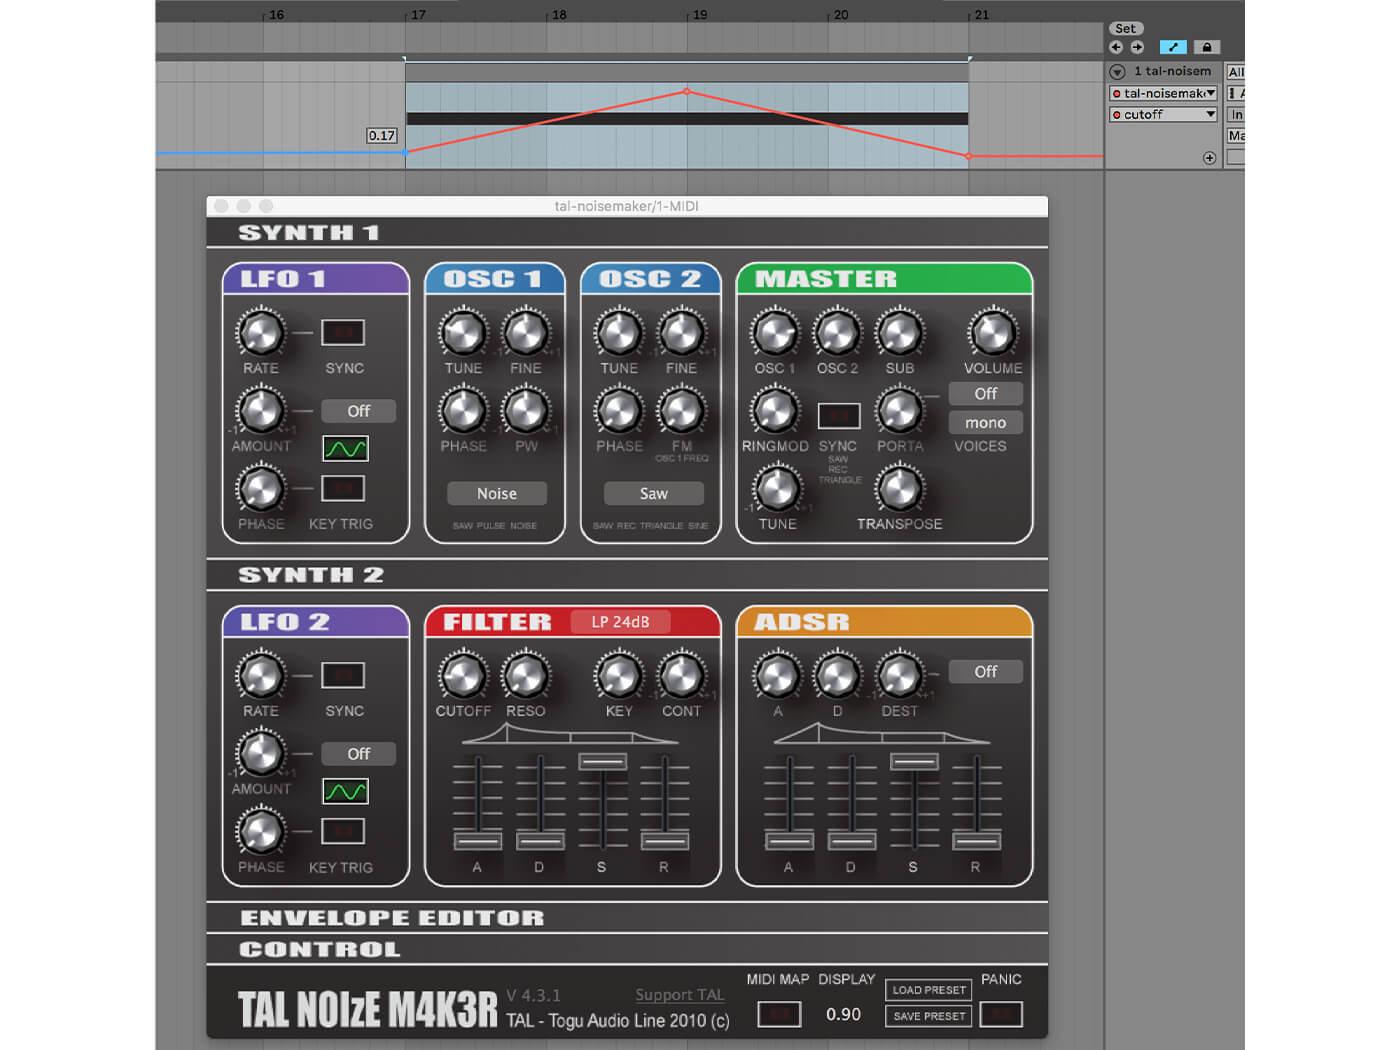 WW-TAL-Noisemaker-P3 - Automation